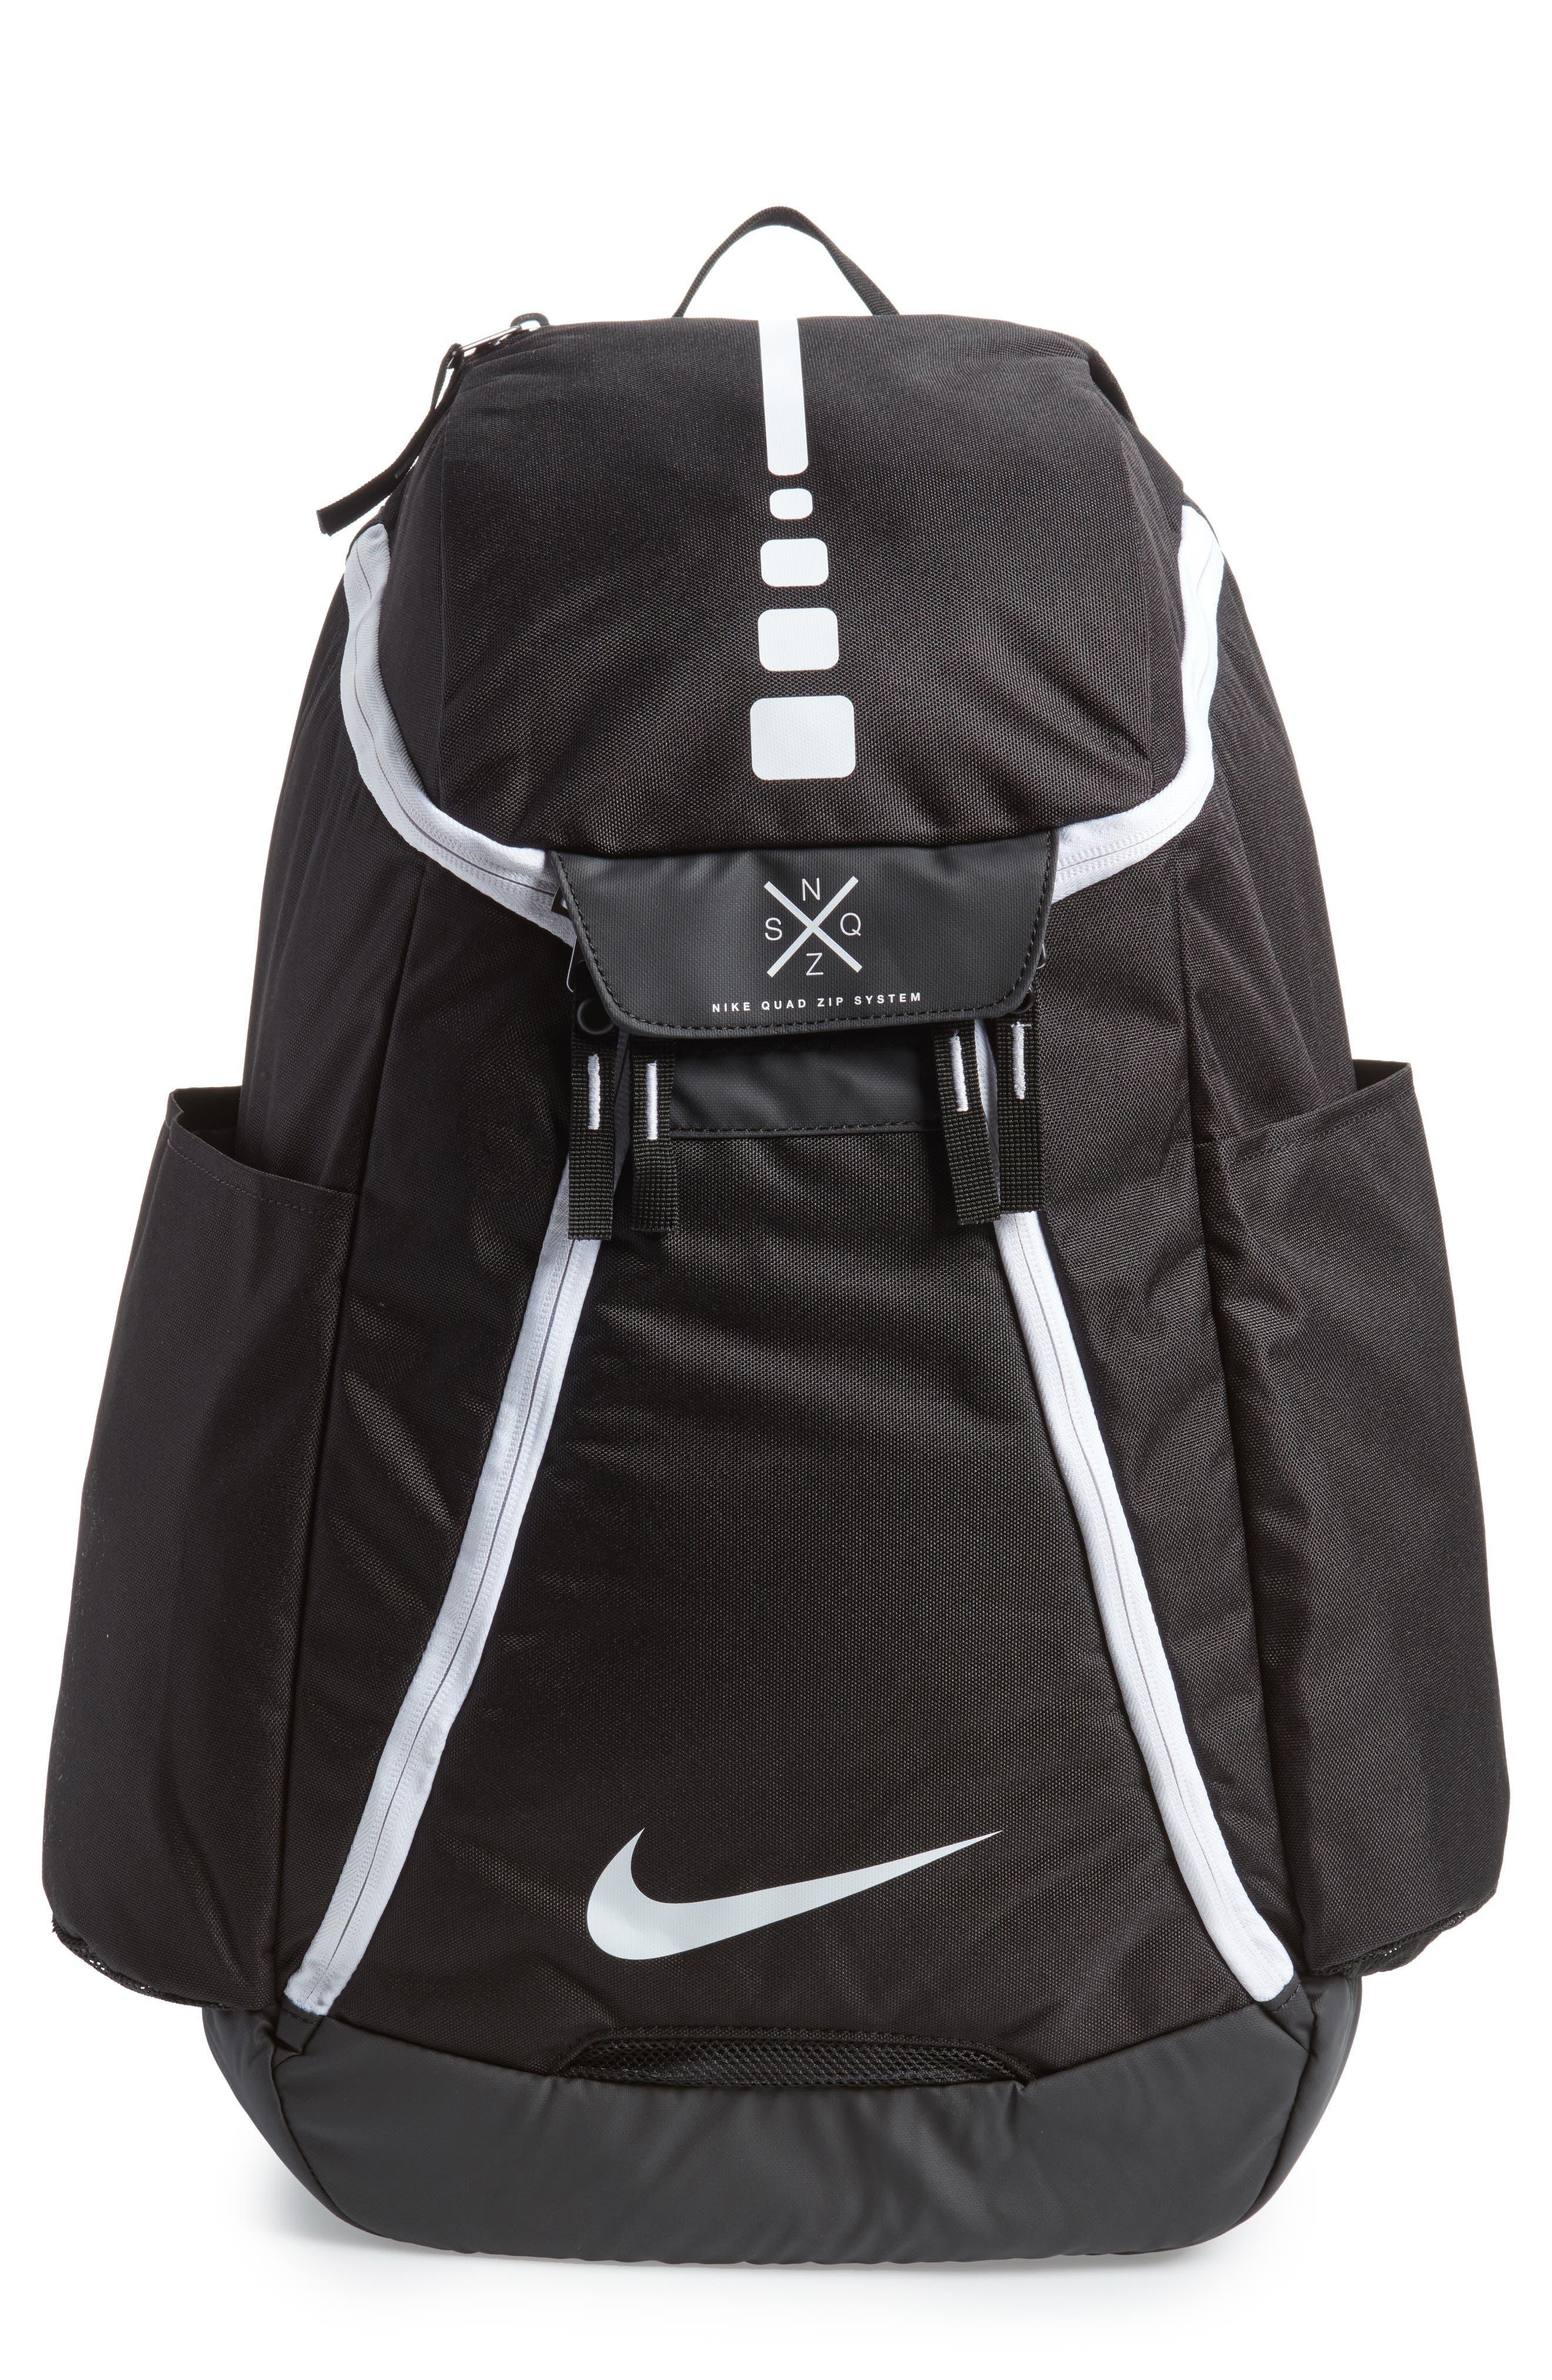 Hoops Elite Max Air Team Backpack,                             Main thumbnail 1, color,                             Black / White